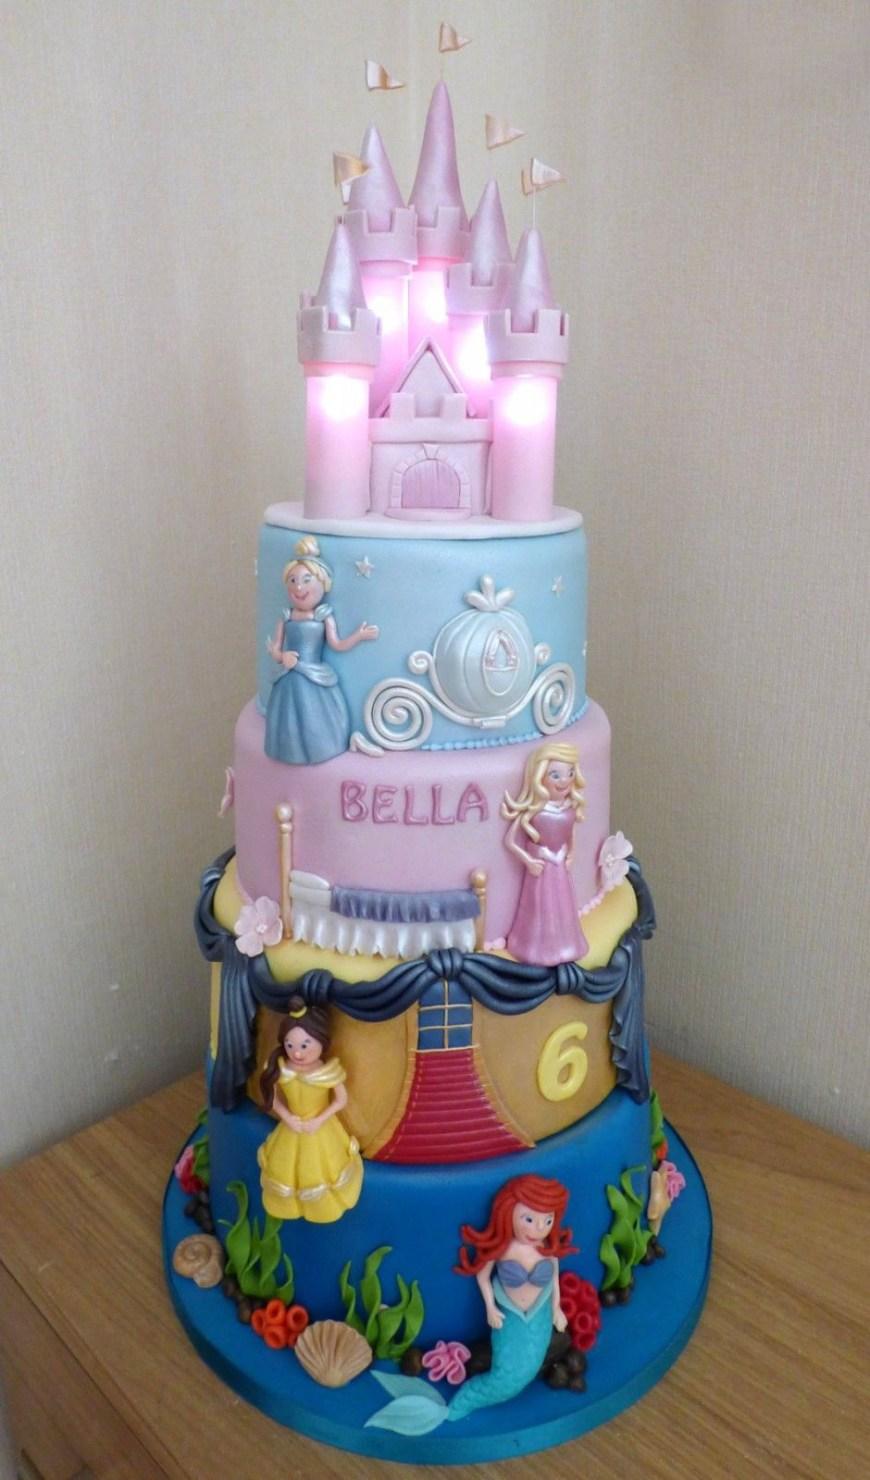 Disney Birthday Cake 4 Tier Disney Princesses Birthday Cake With An Illuminated Castle